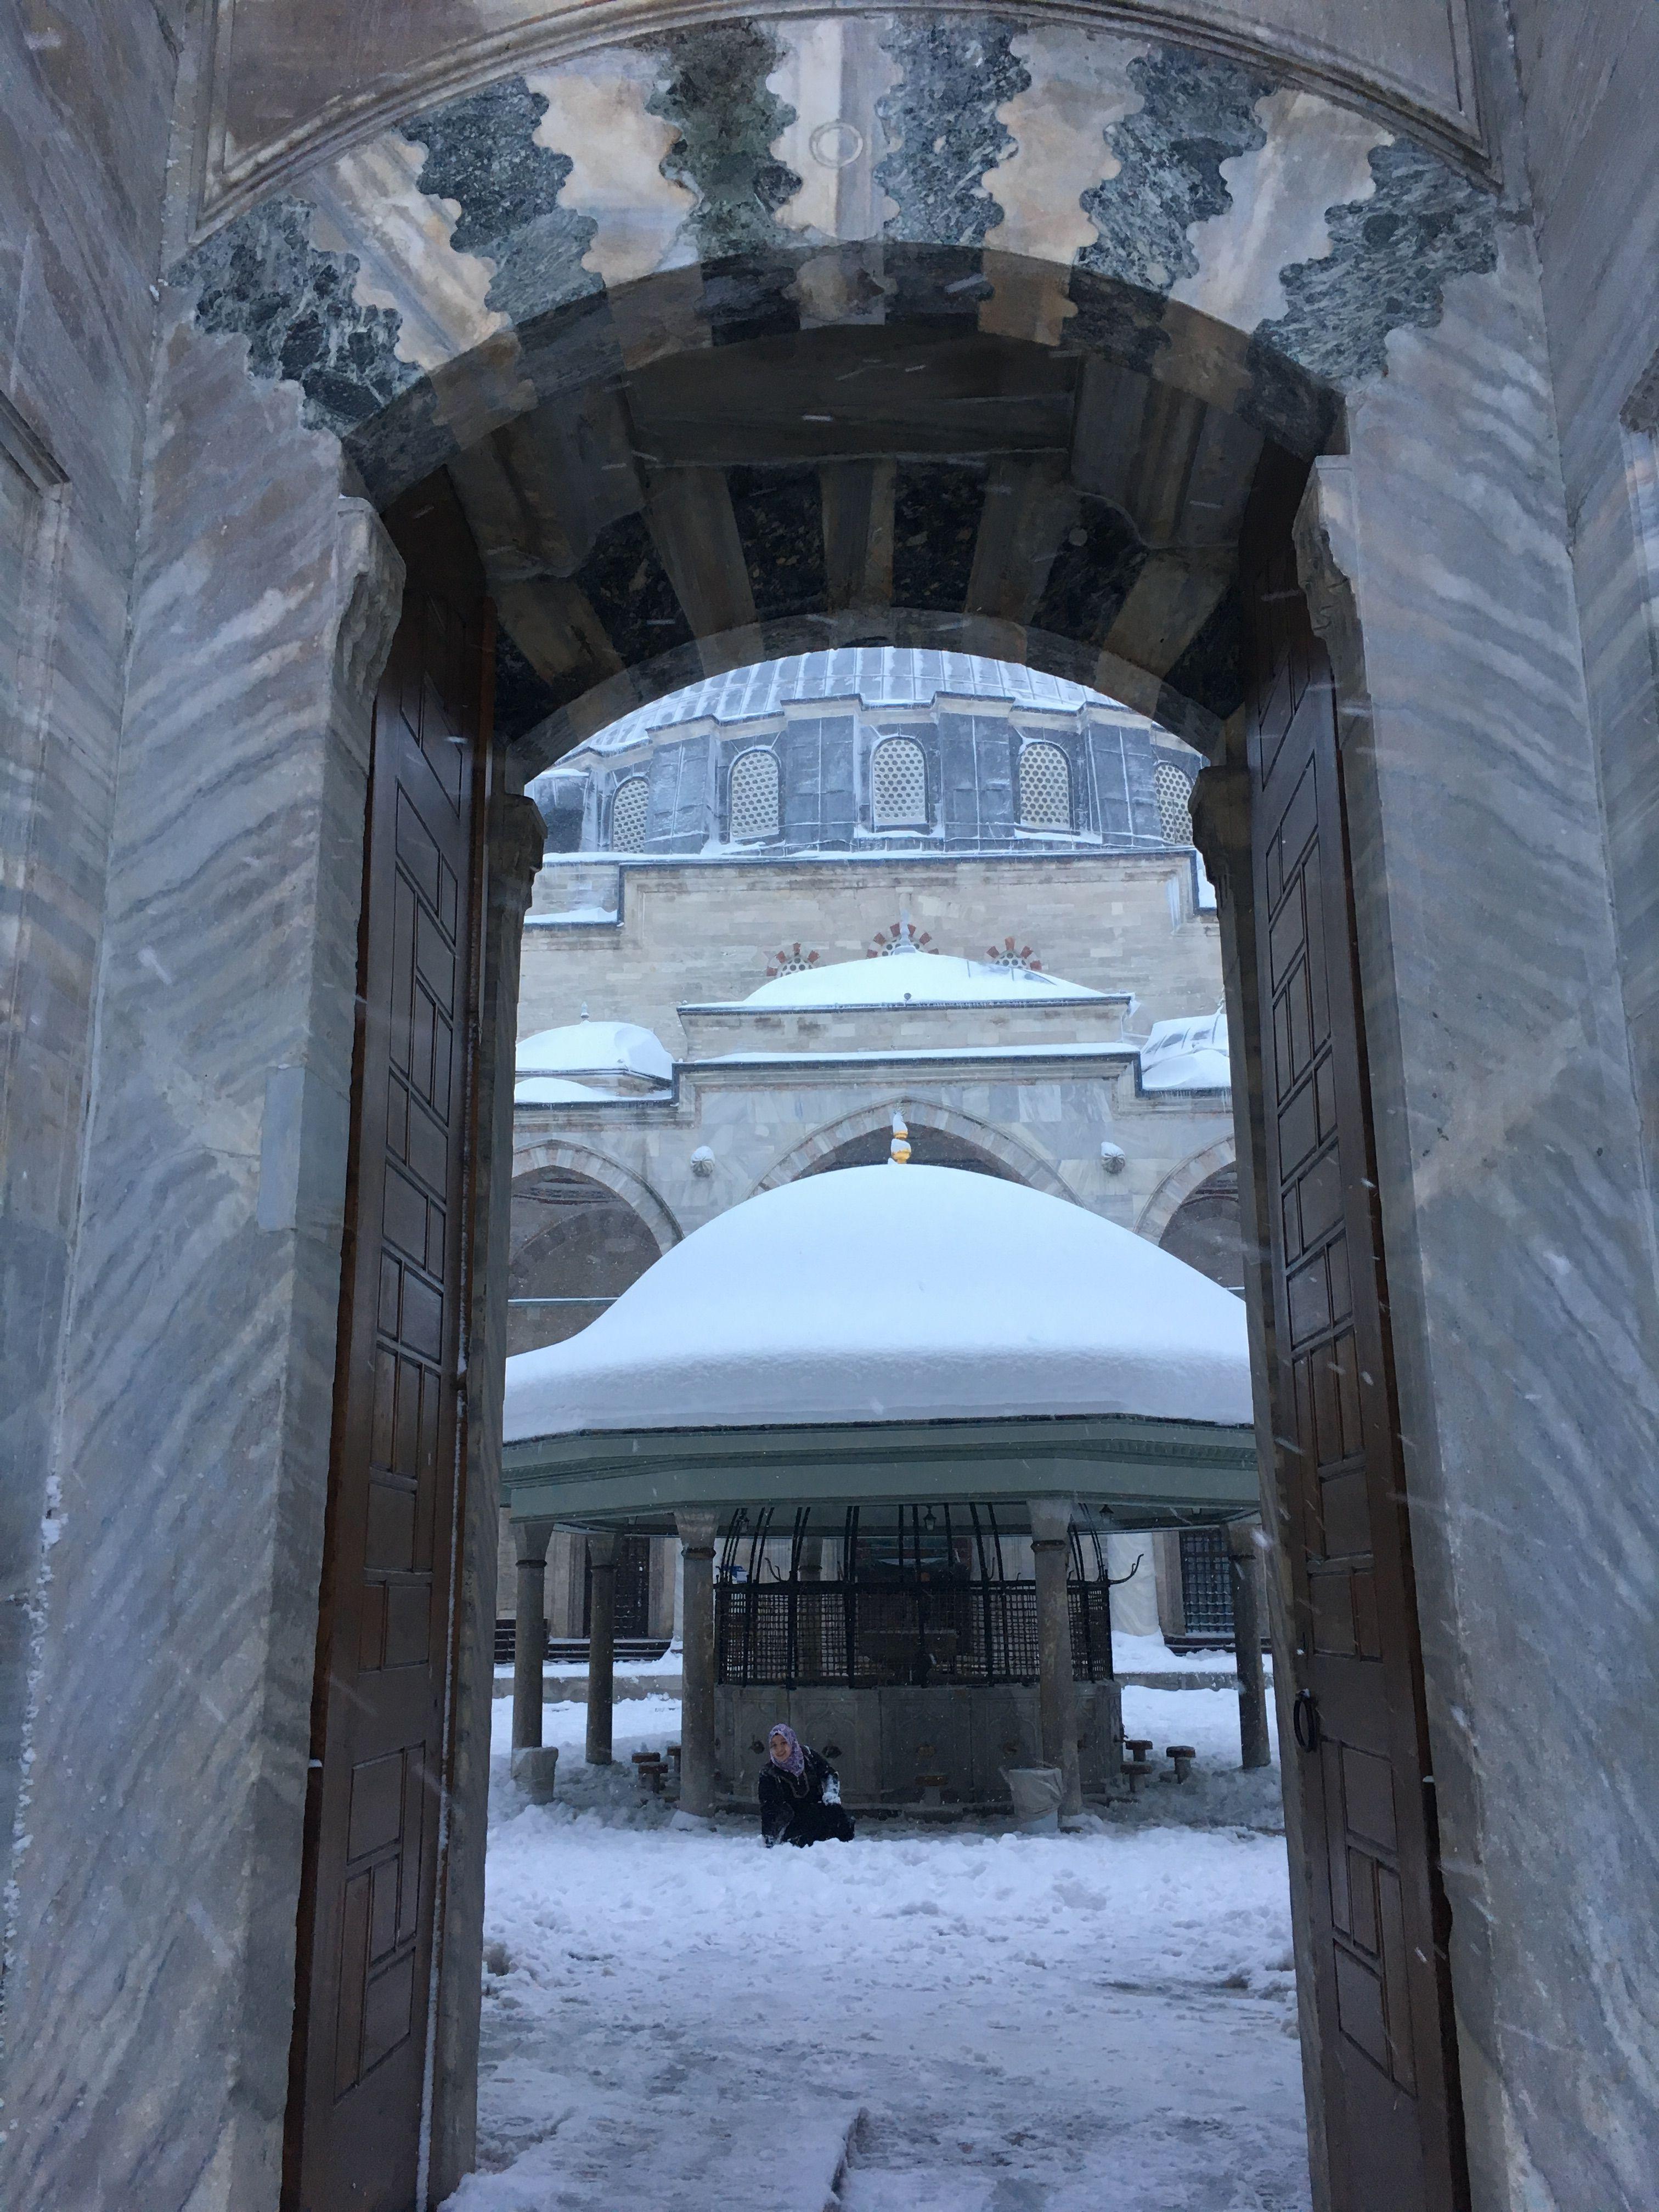 Yavuz Selim Camii-Mosque 10/01/2017